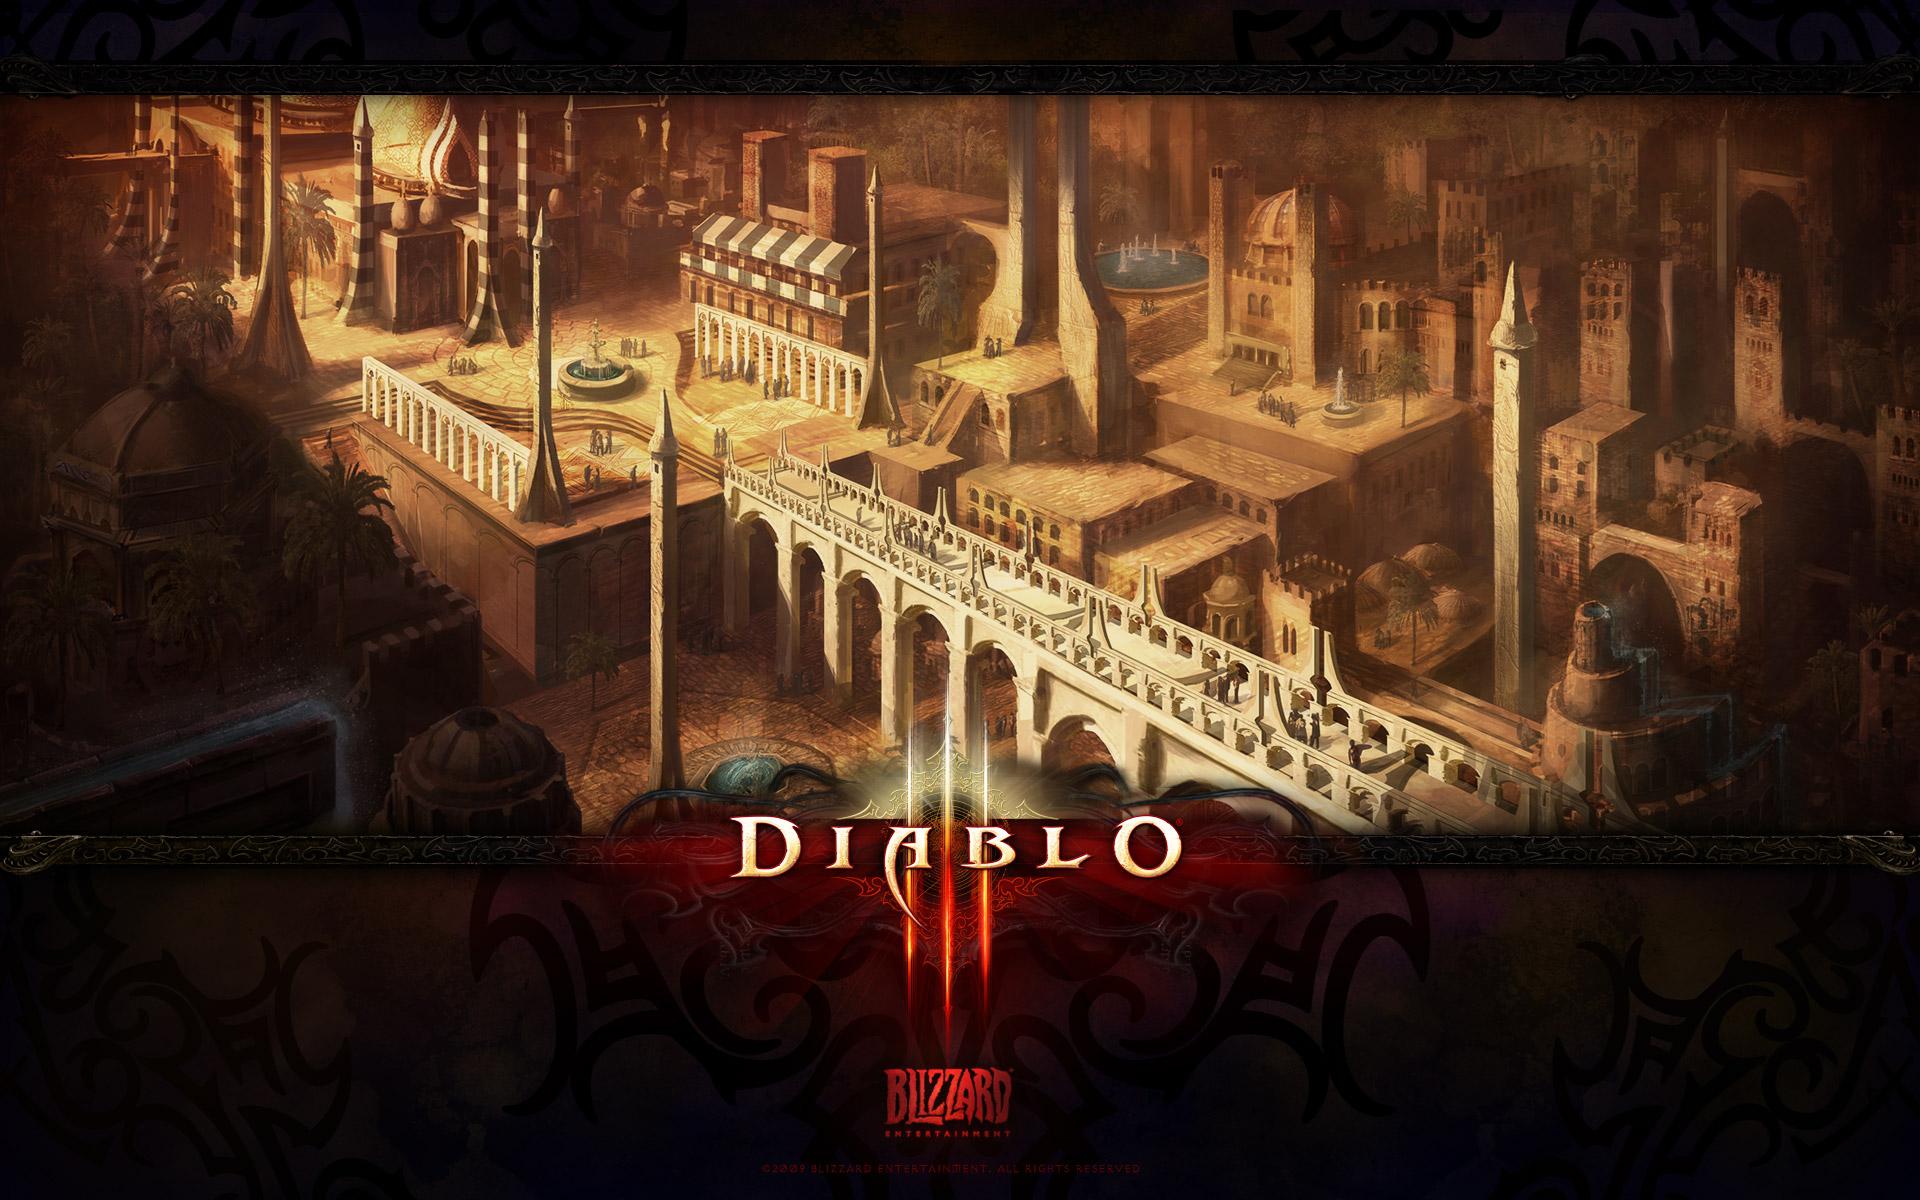 1920×1080 Diablo 3 Desktop PC And Mac Wallpaper | Wide Screen Wallpaper 1080p,2K,4K